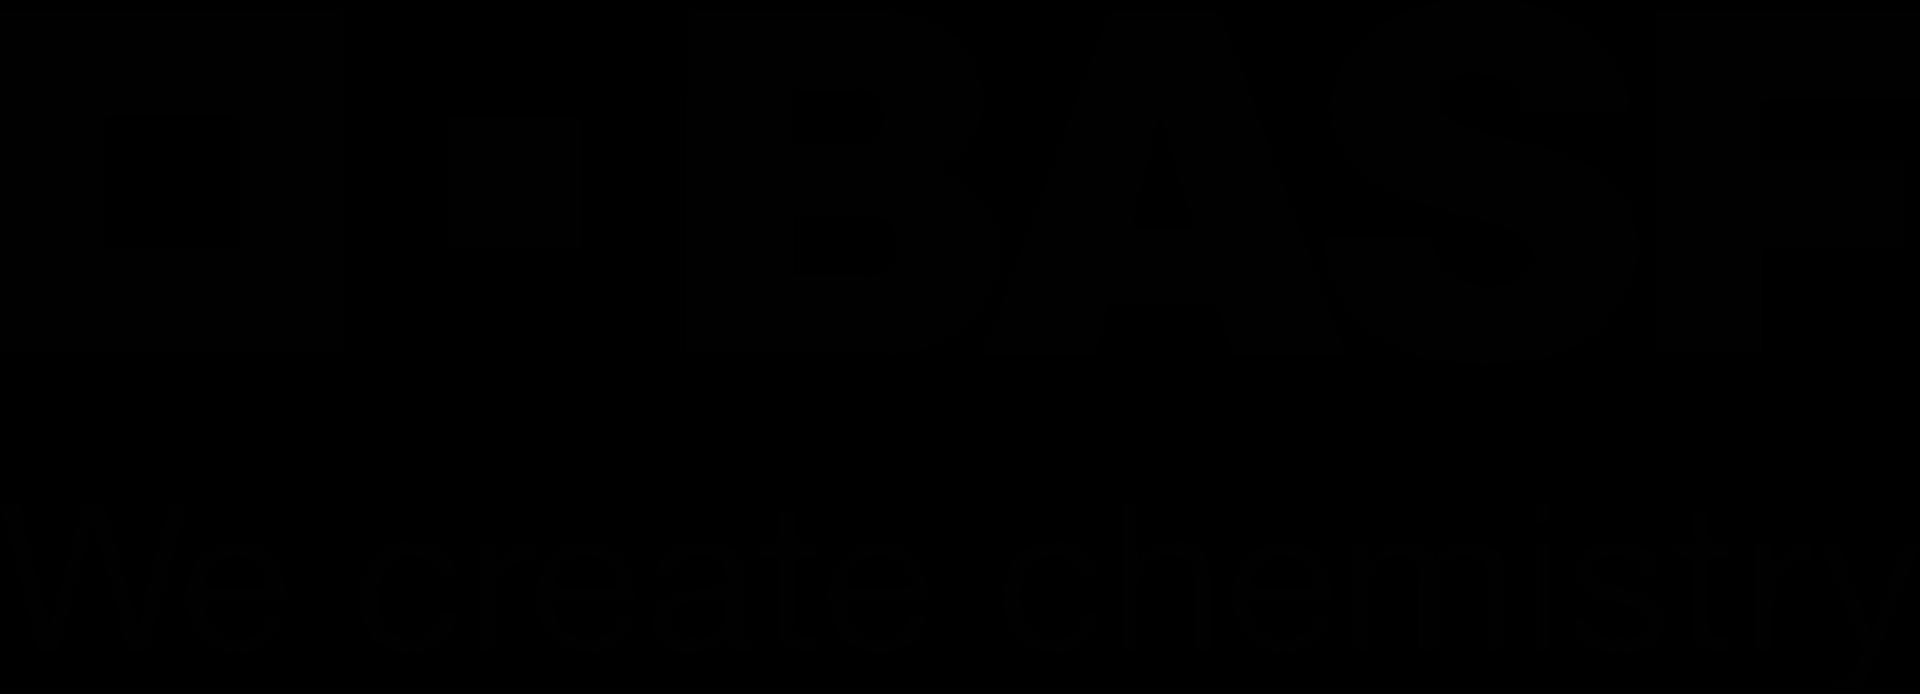 2000px-basf-logo_bw-svg